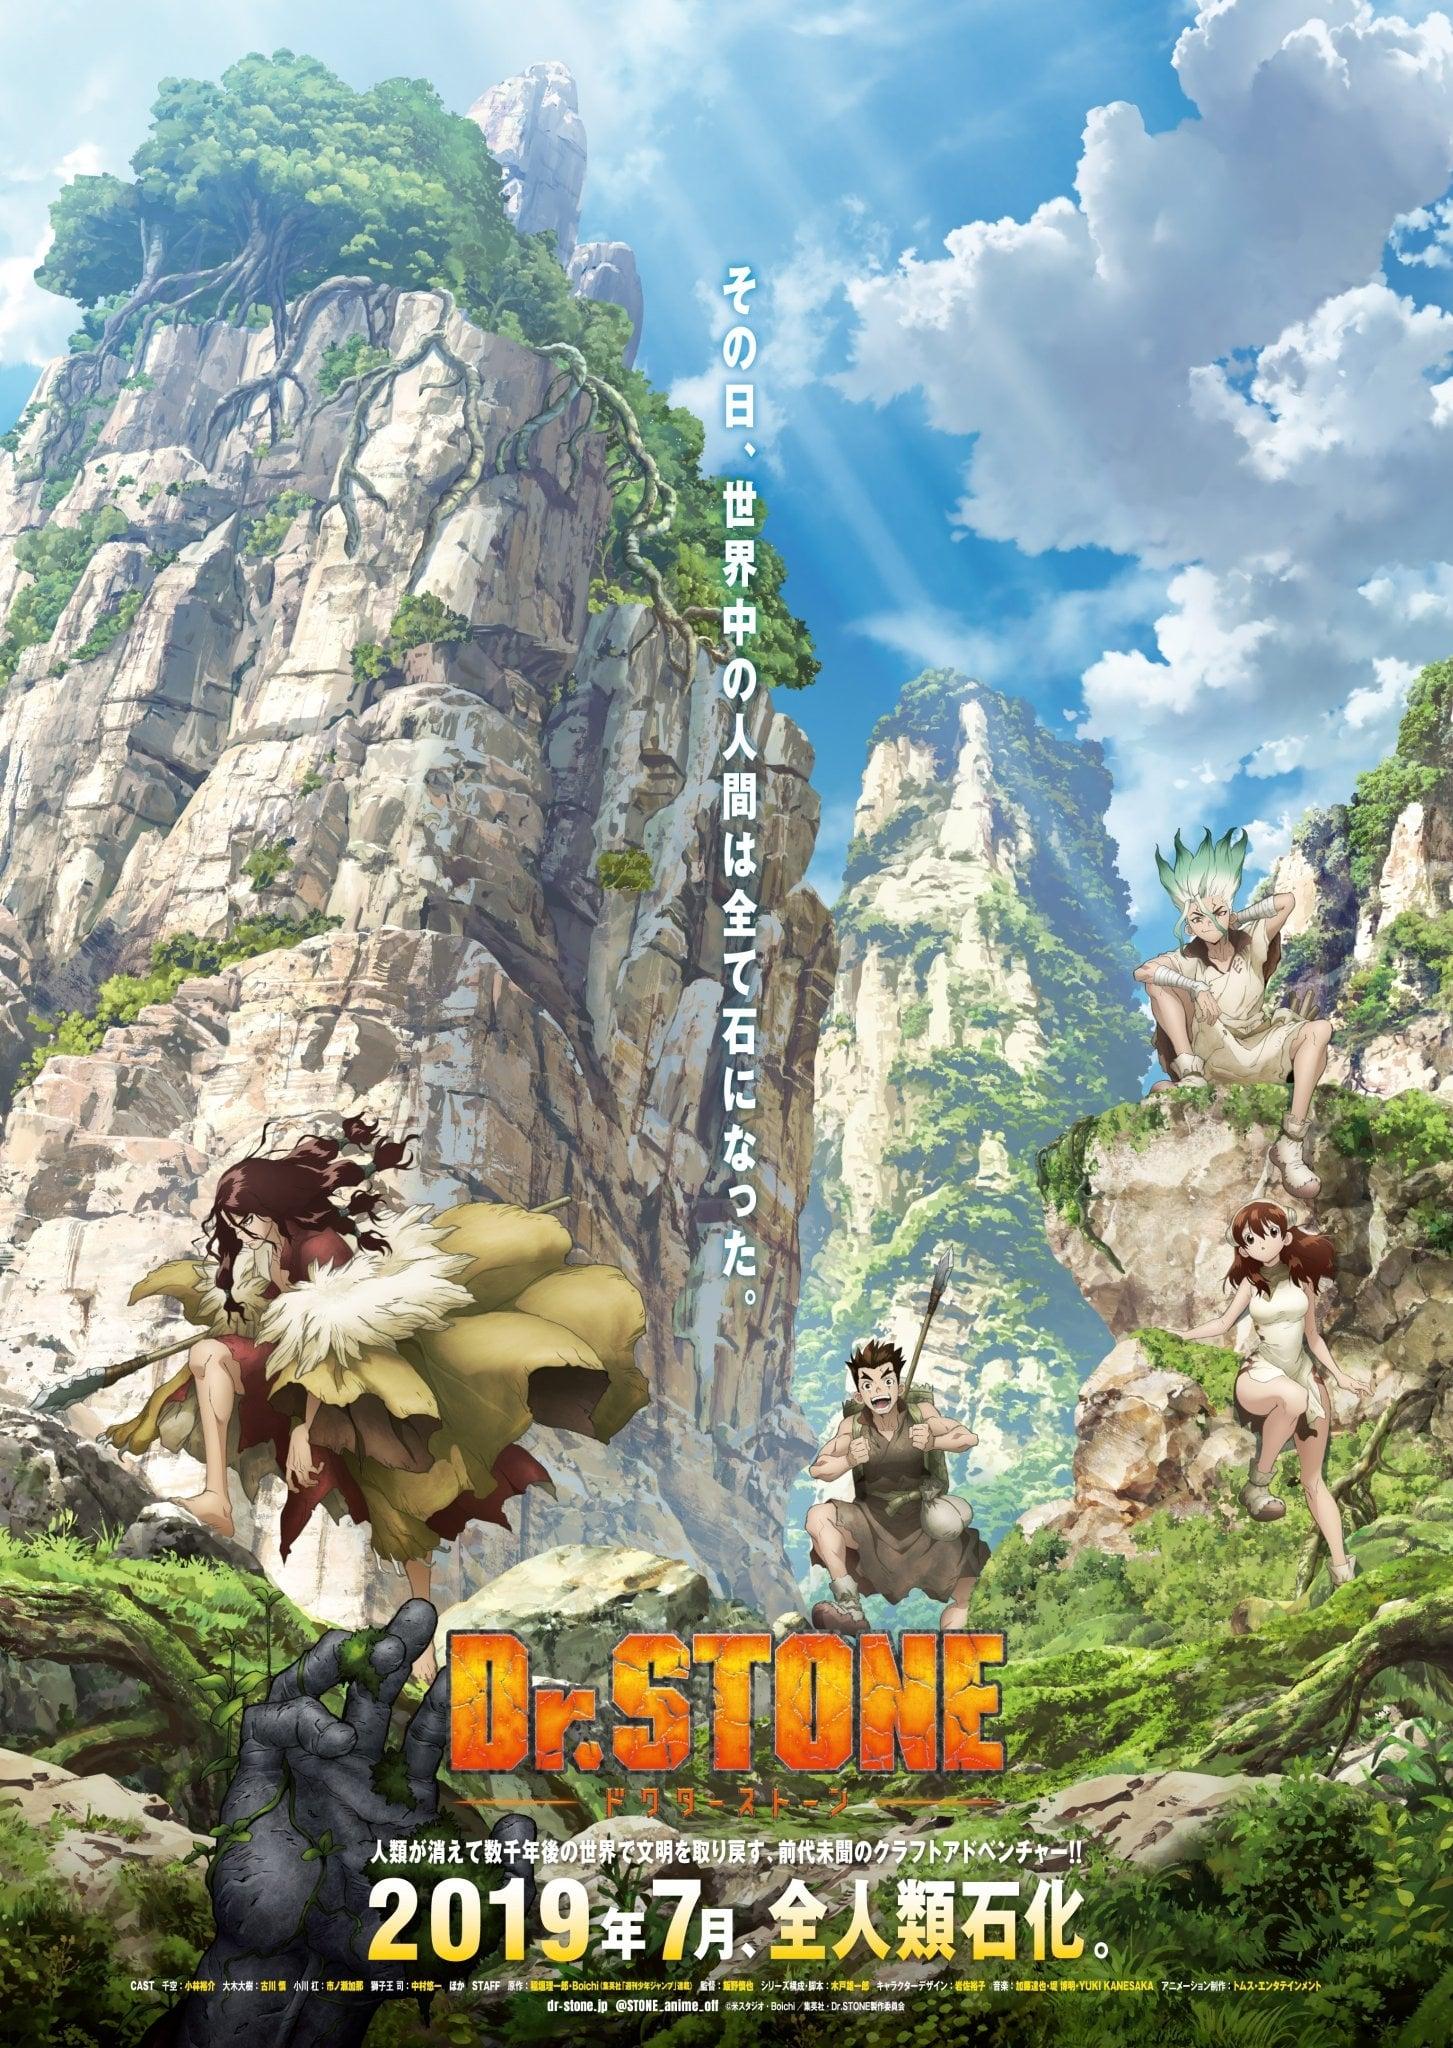 dr-stone-ตอนที่-1-10-ซับไทย-ยังไม่จบ-